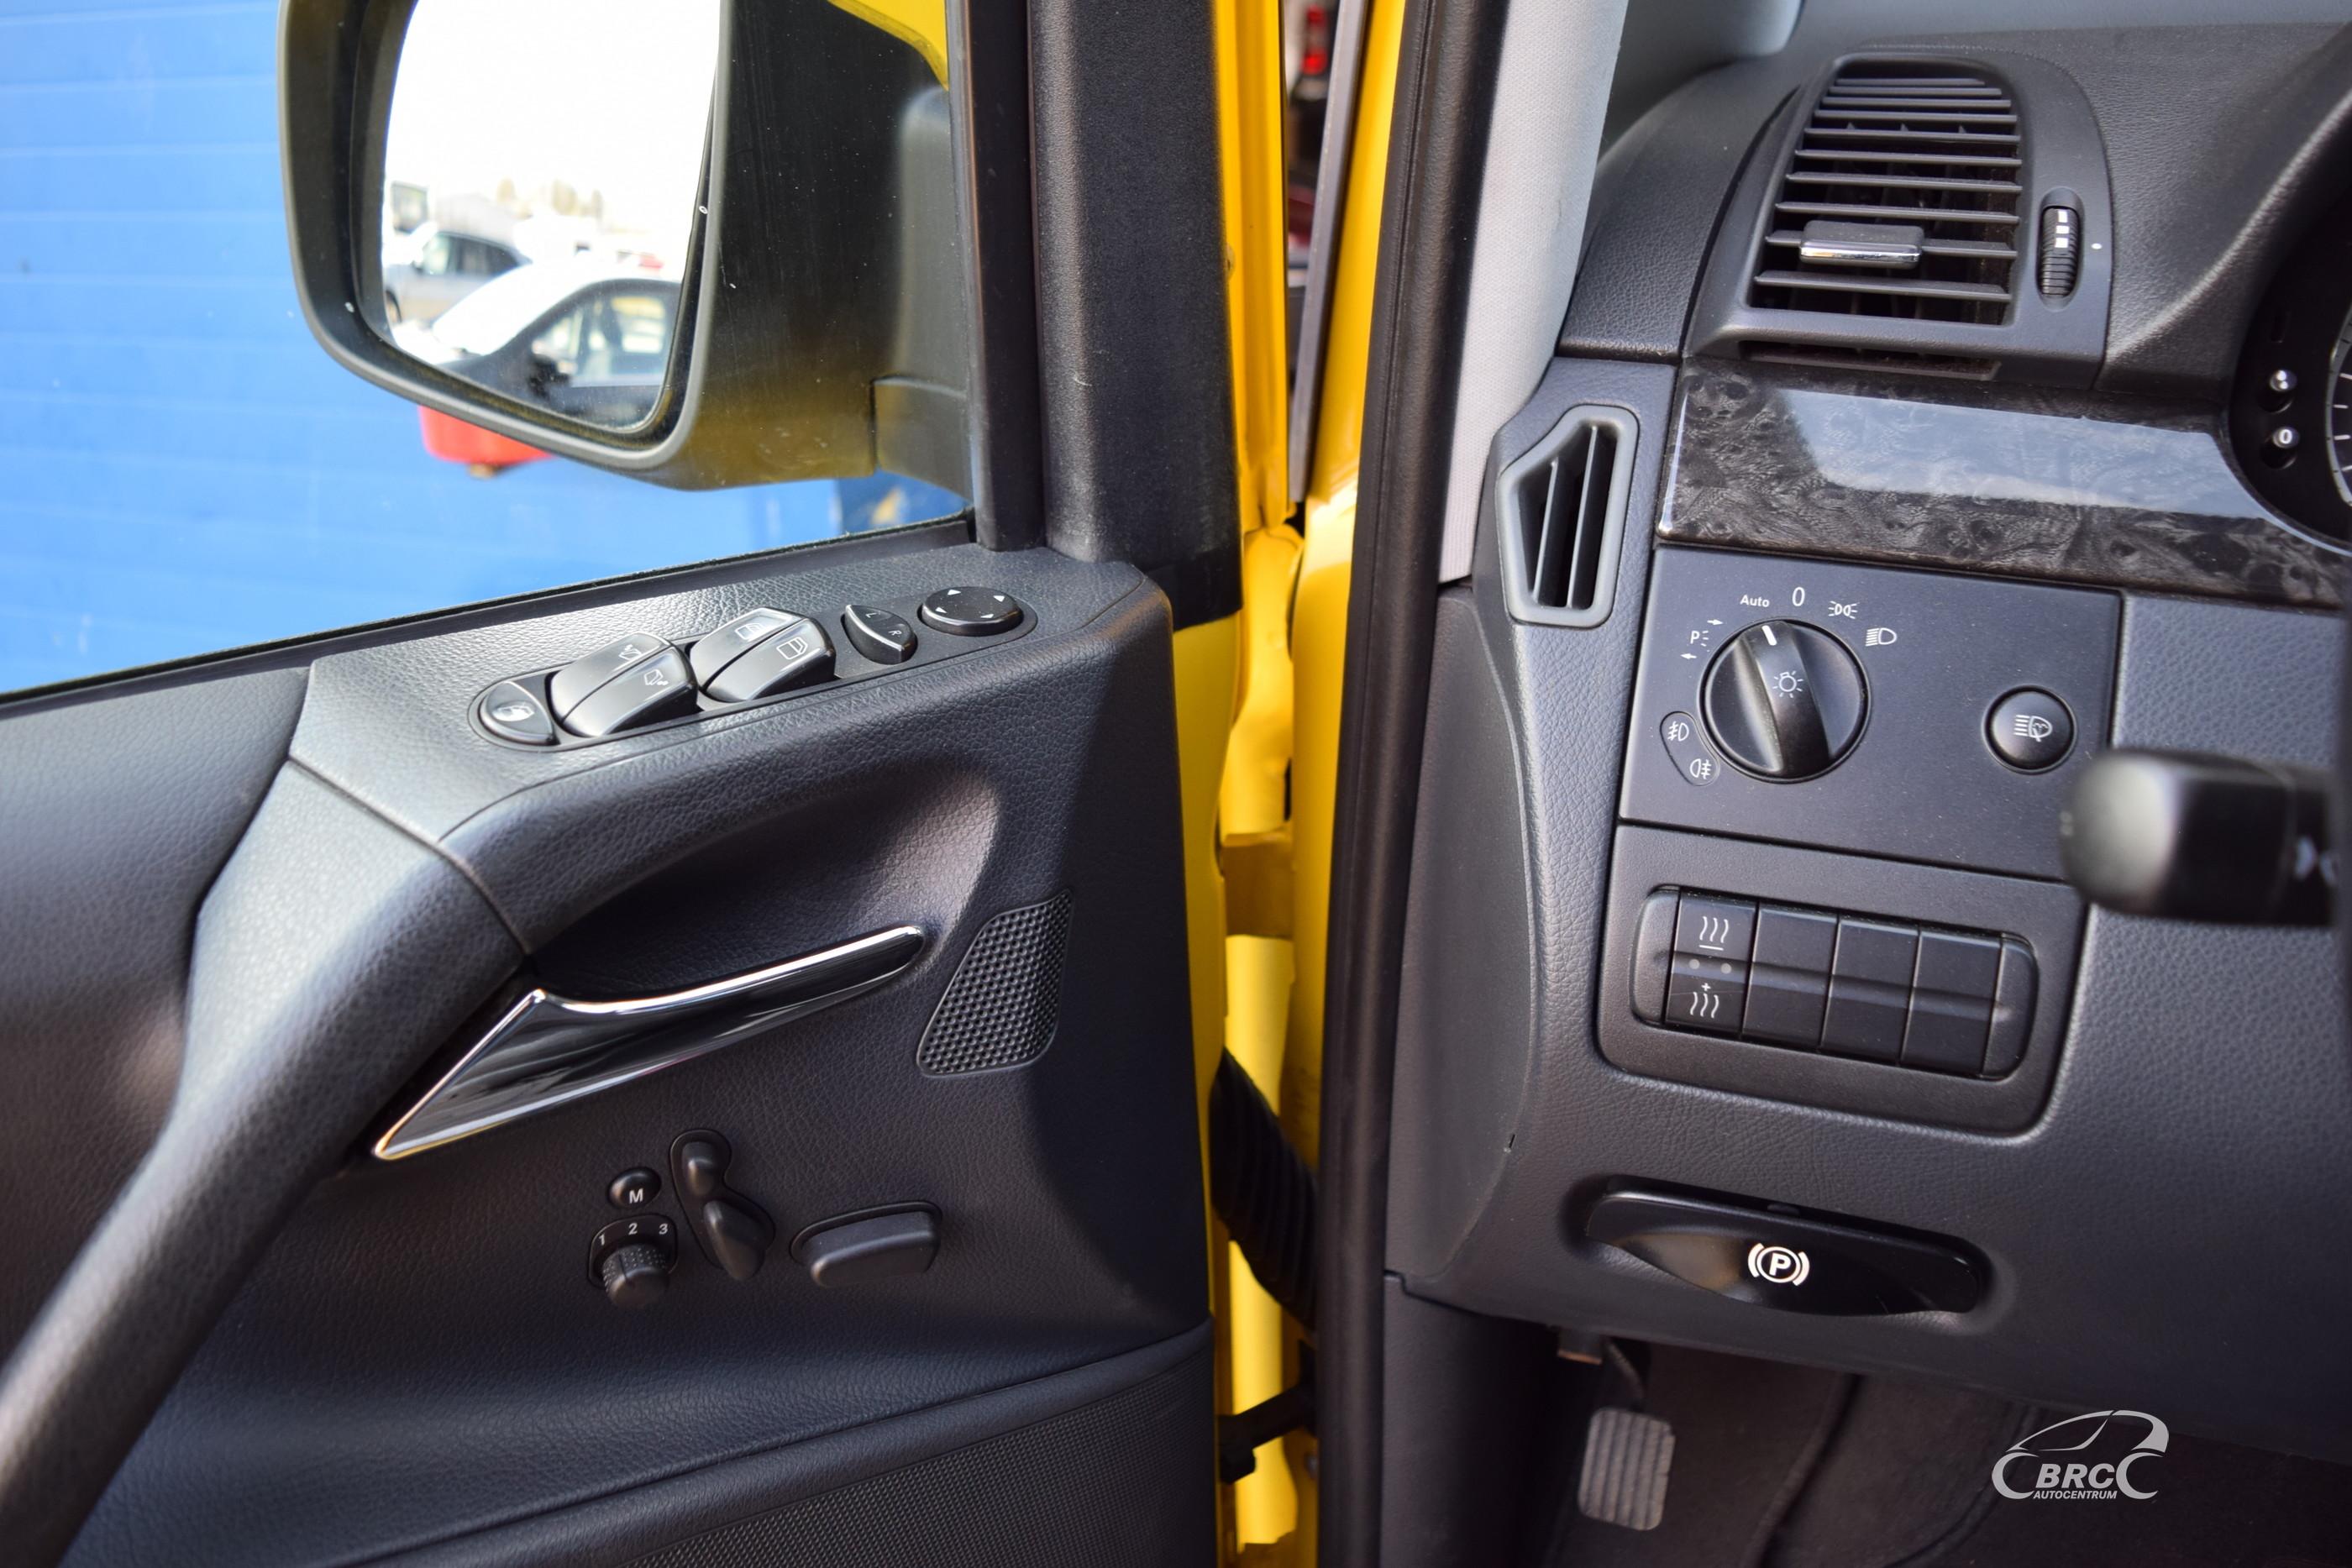 Mercedes-Benz Viano V6 Ambiente A/T 8 seats